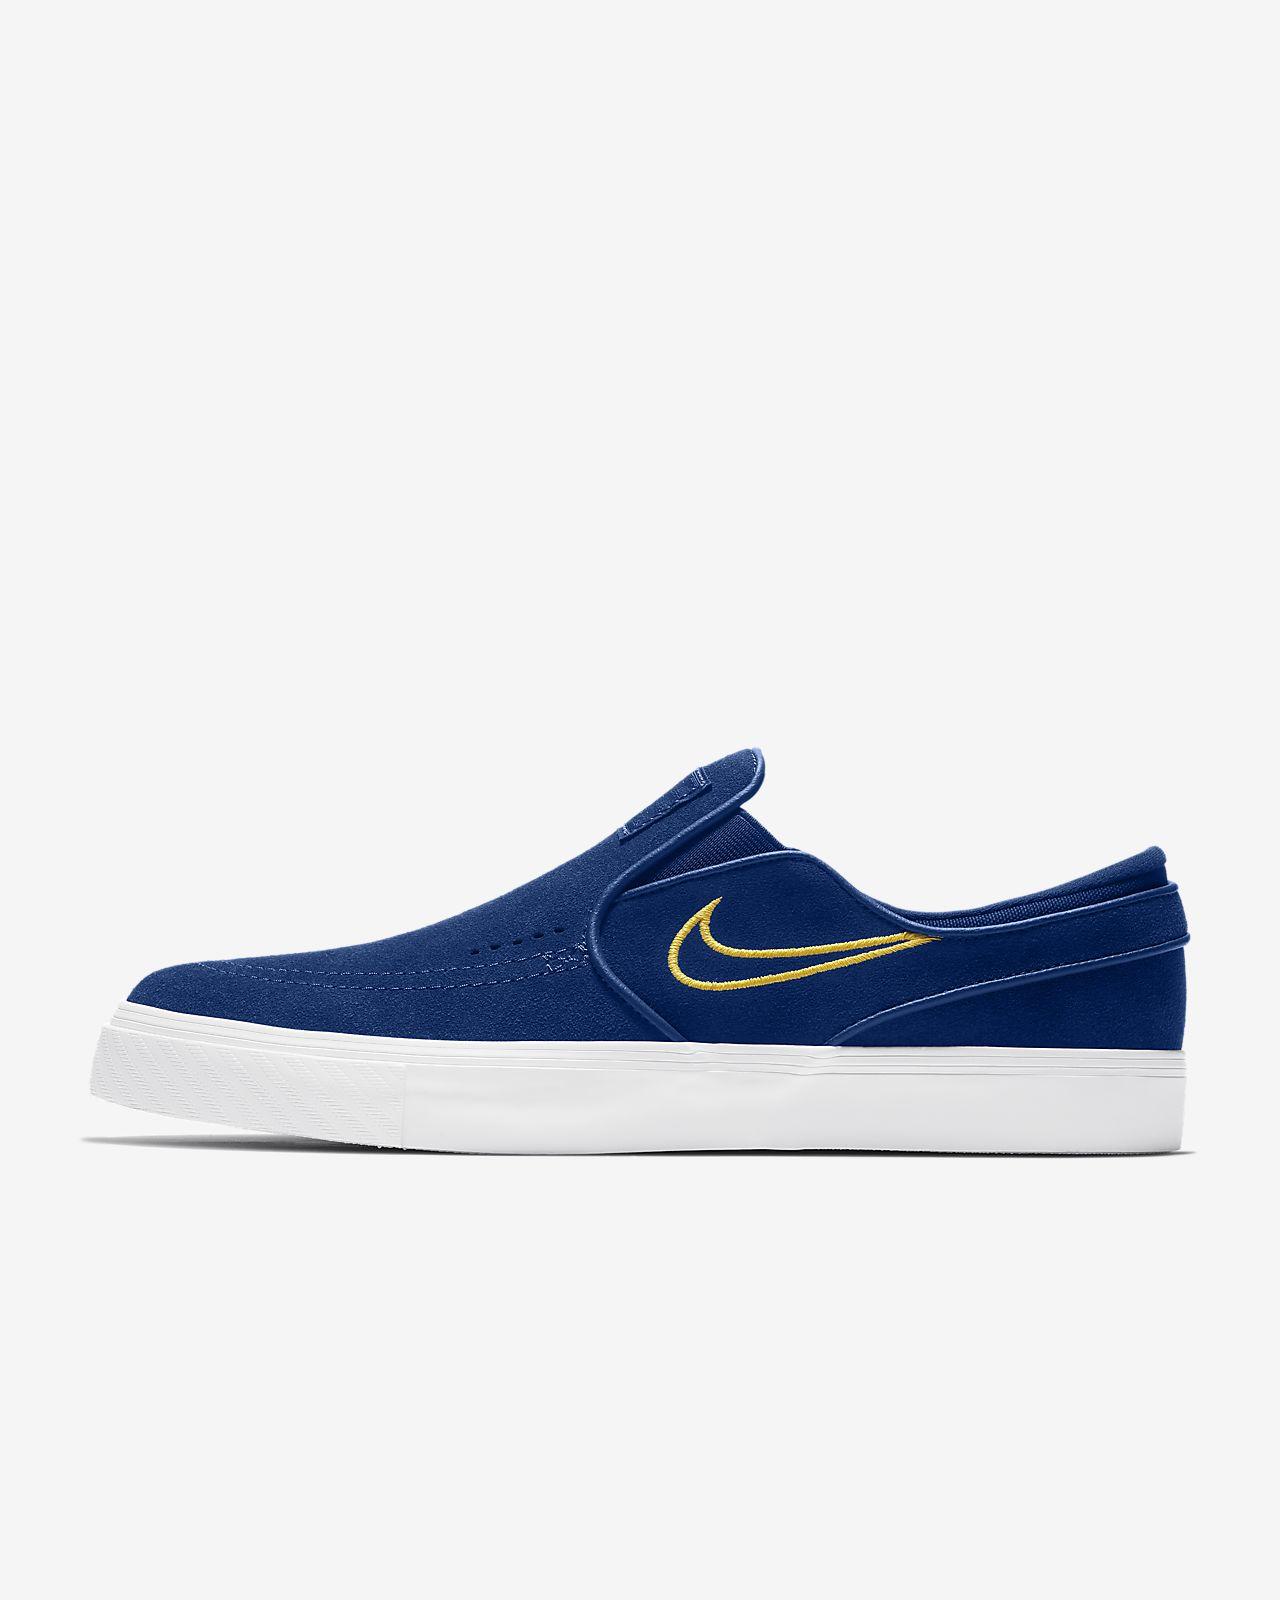 Chaussure de skateboard Nike SB Zoom Stefan Janoski Slip On pour